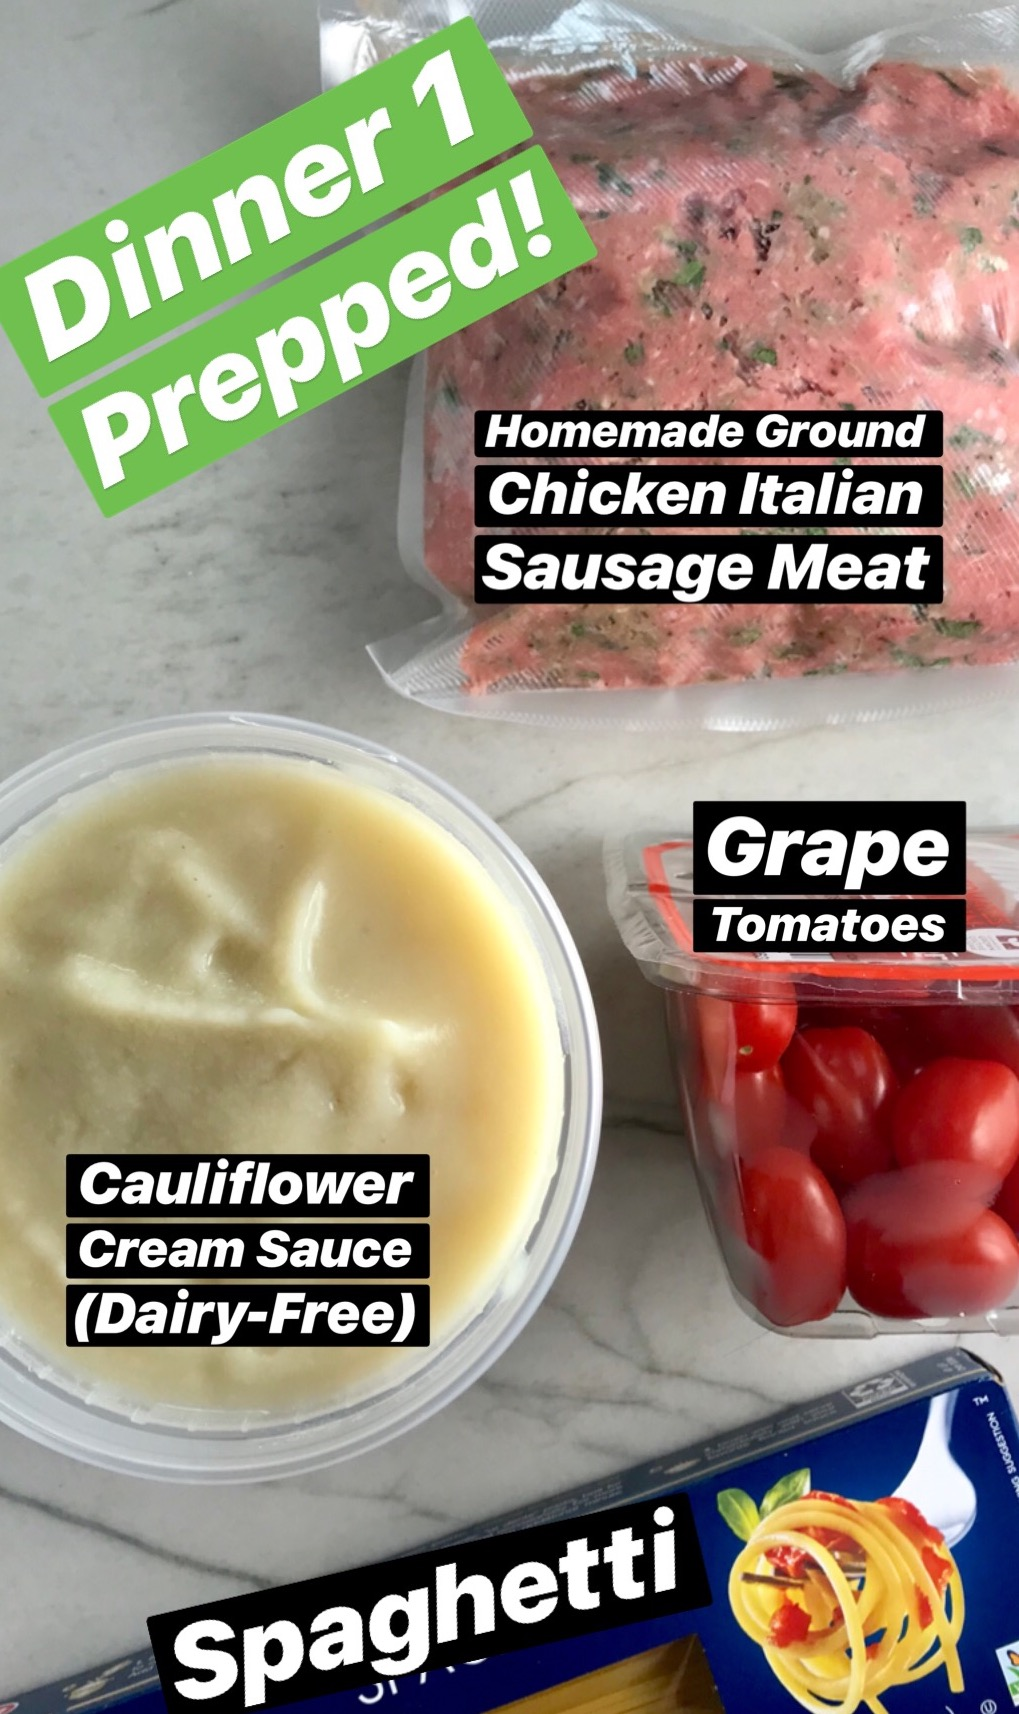 Italian Sausage Cauli-Cream Pasta Prepped Dinner Kit